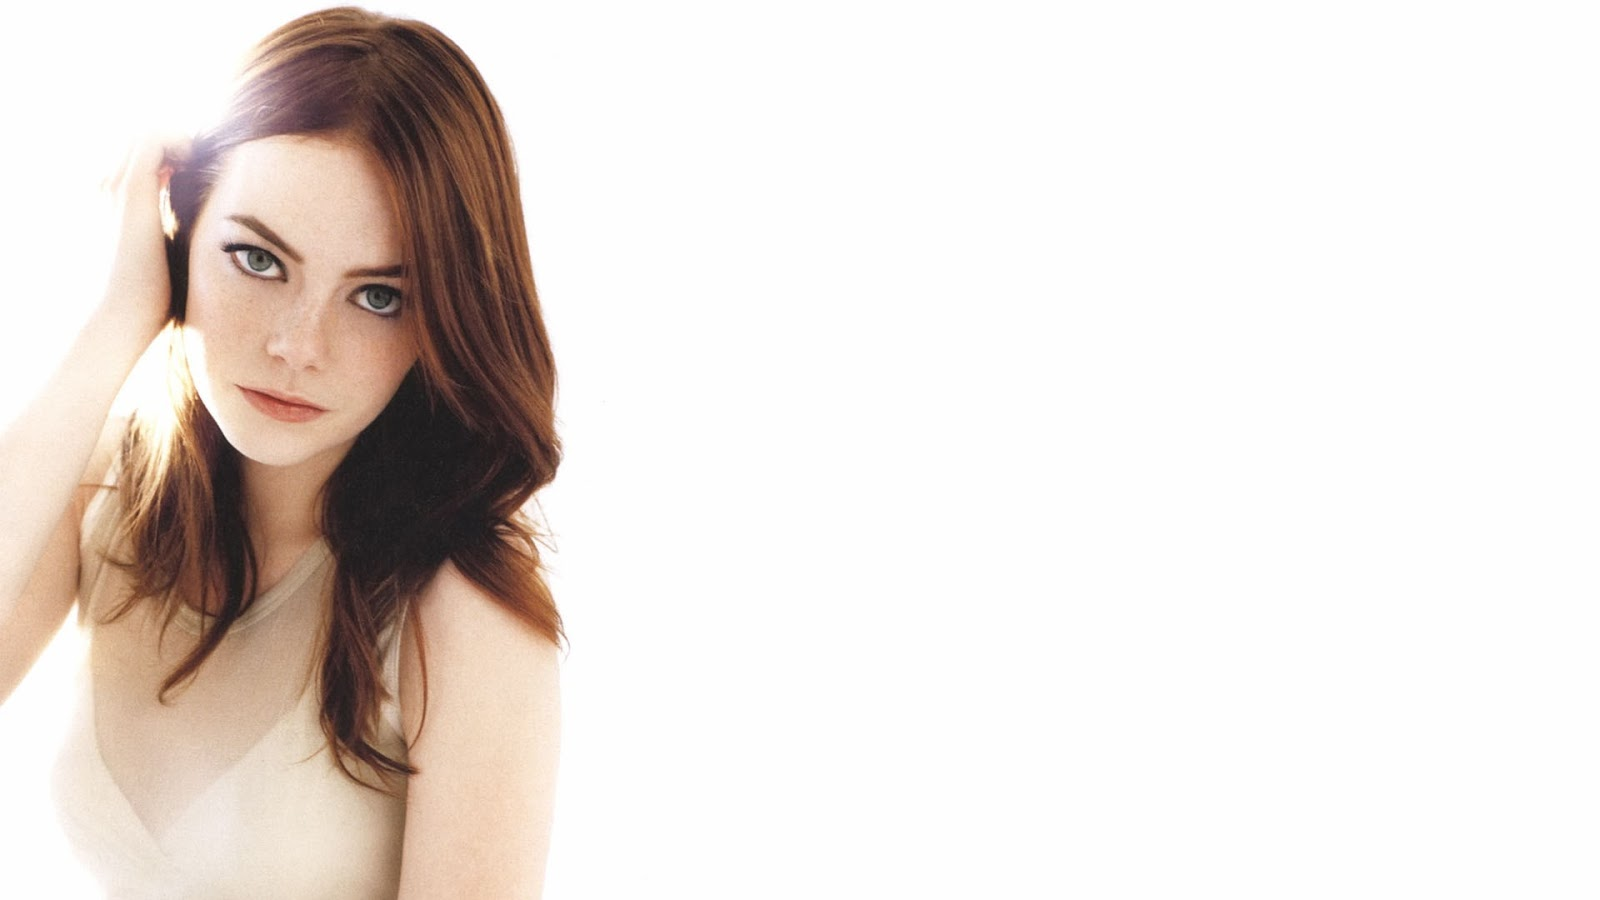 Andrew Garfield Wallpaper Iphone Emma Stone Emma Stone Wallpapers